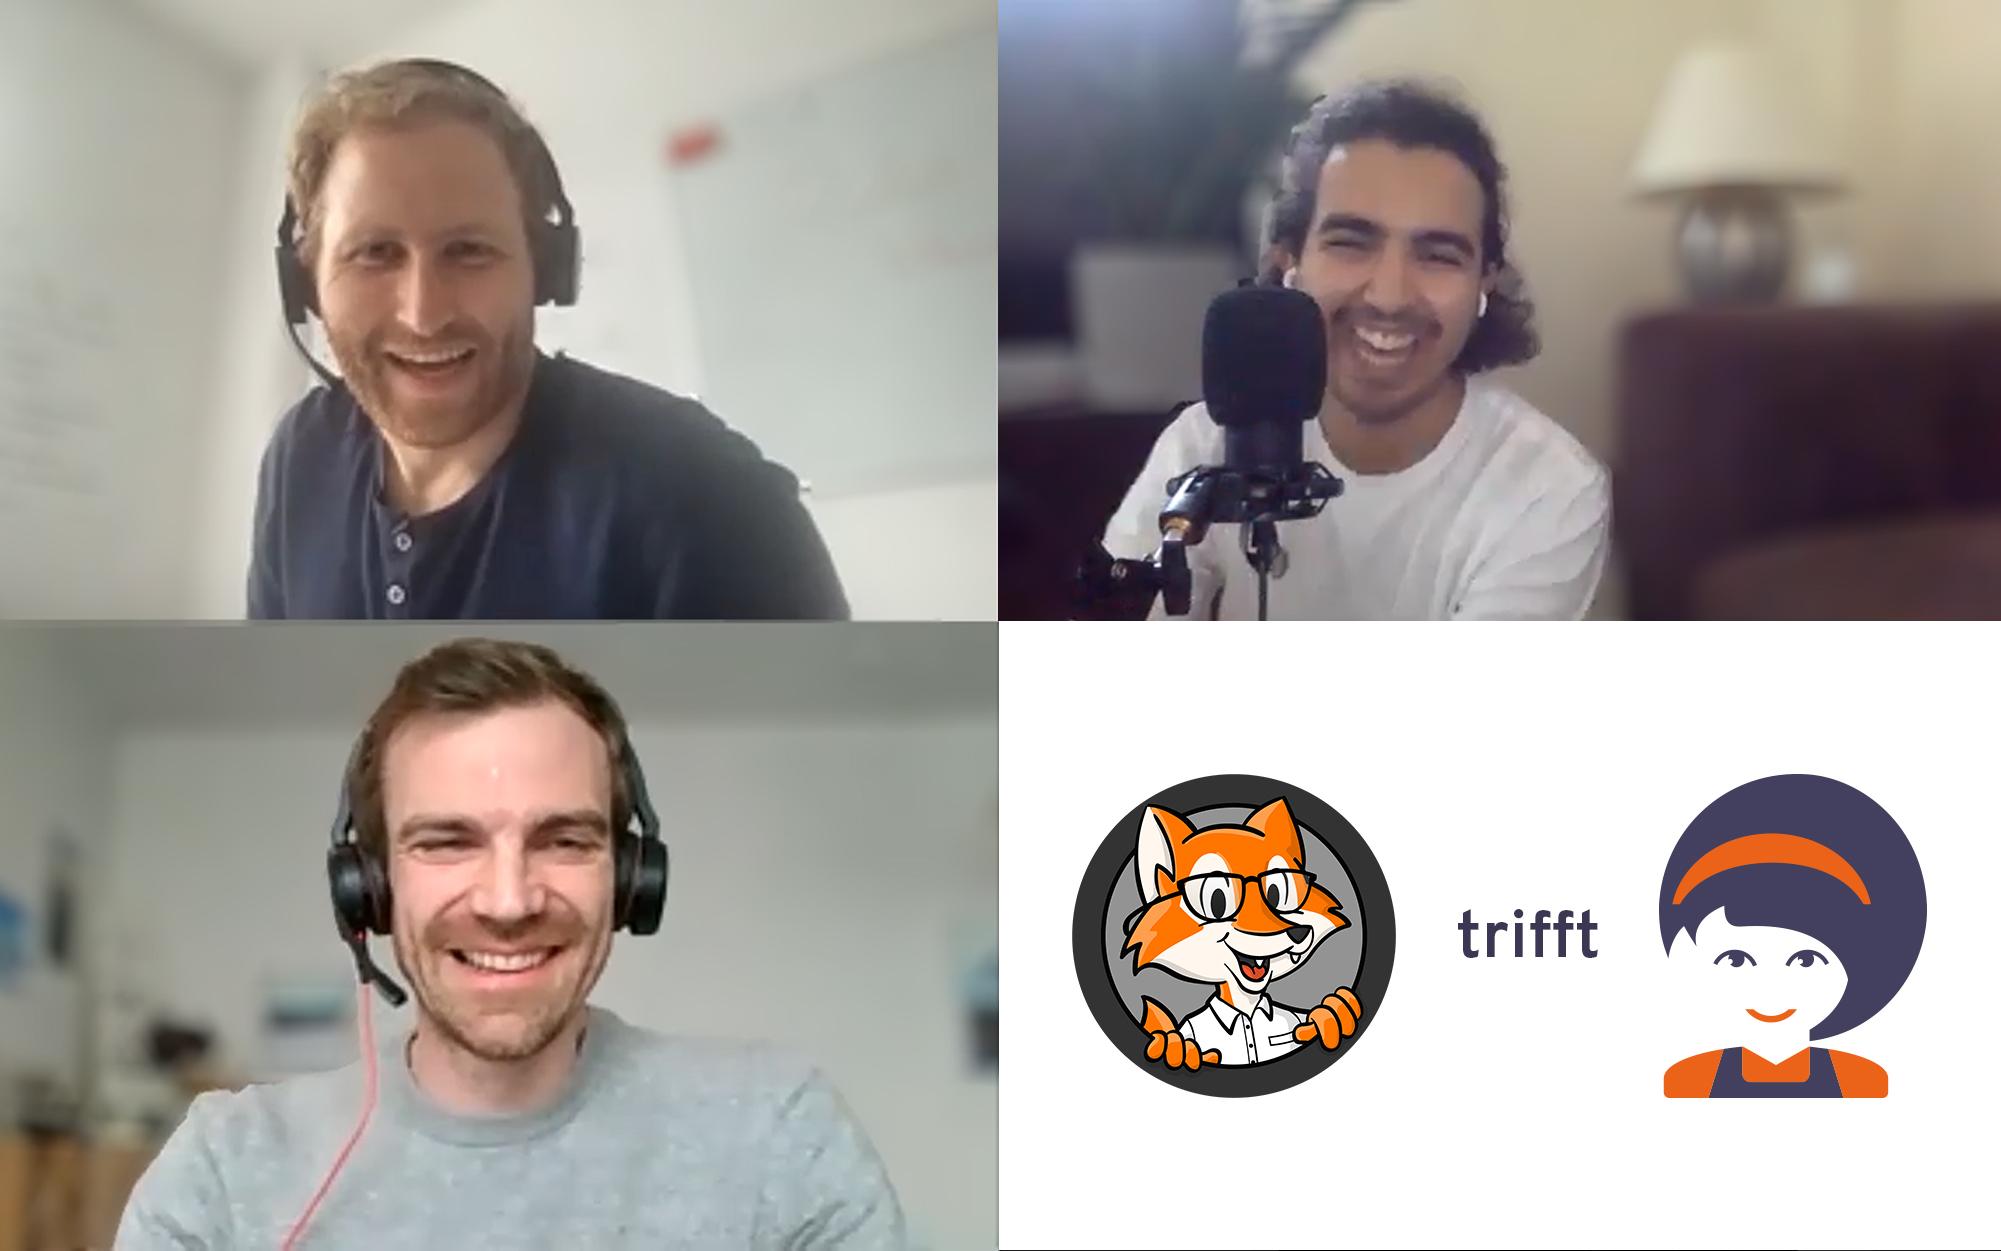 Qualität Vor Blitzstart: BringLiesel Beim Podcast Podsimpel